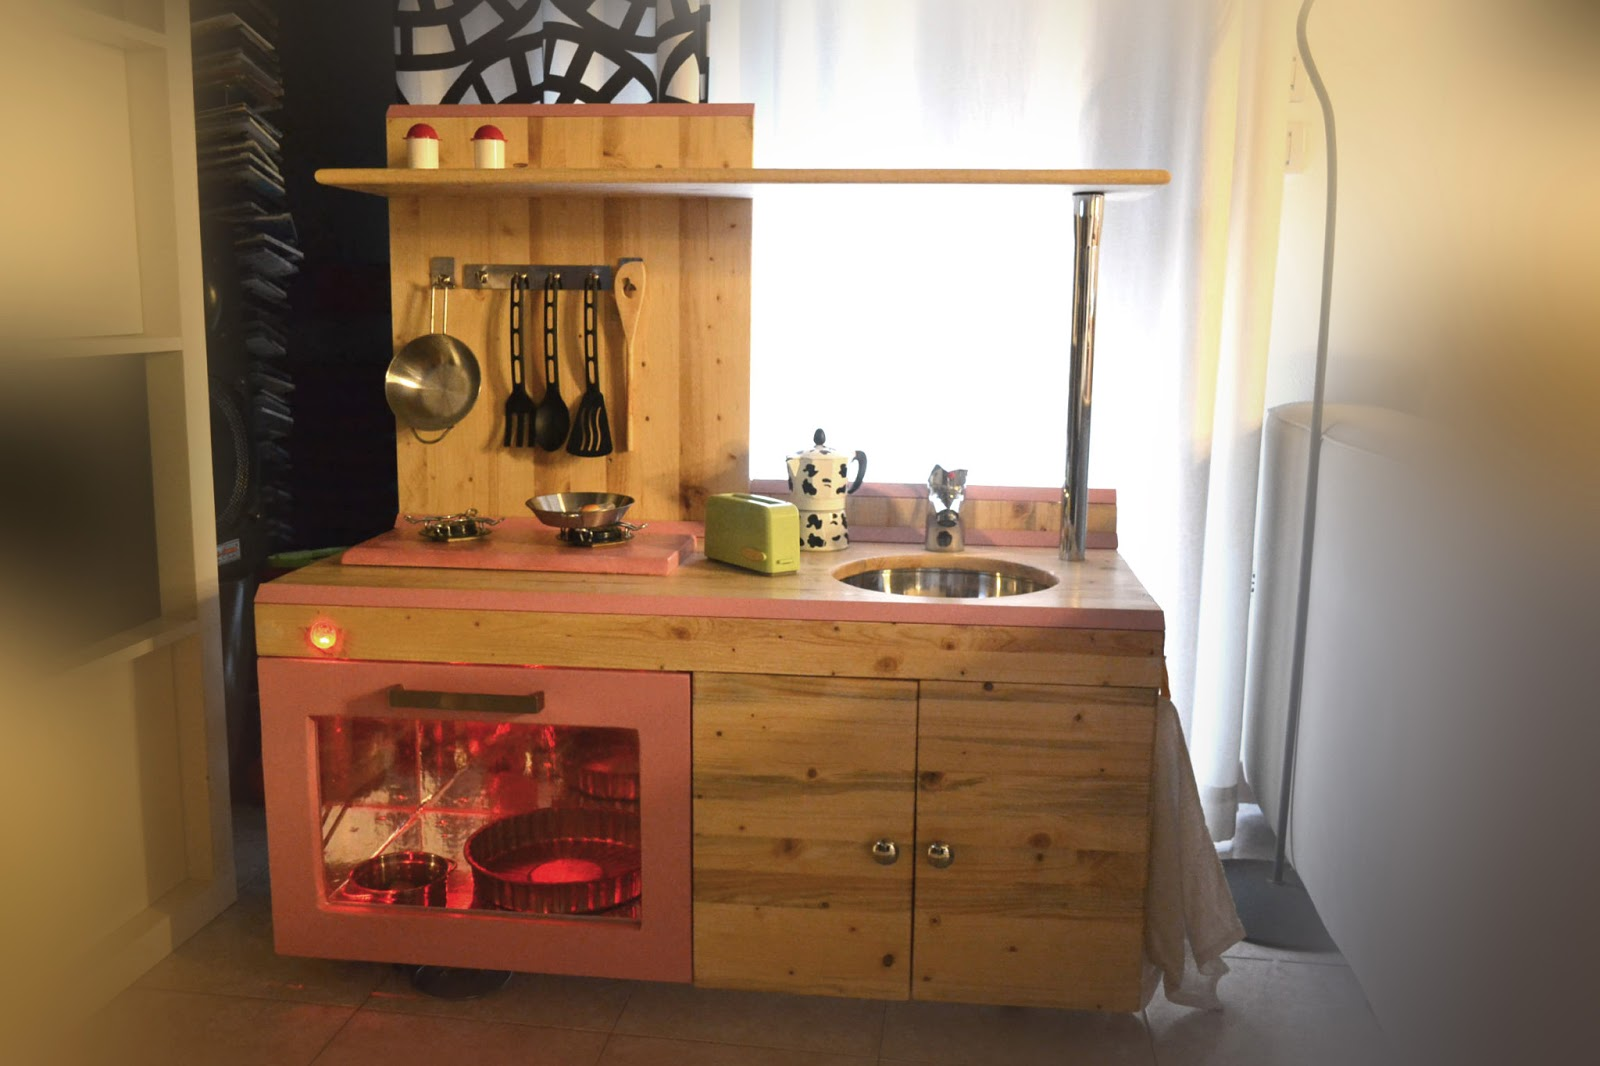 Mammarum come costruire una cucina per bambini di legno - Cucine fai da te in legno ...